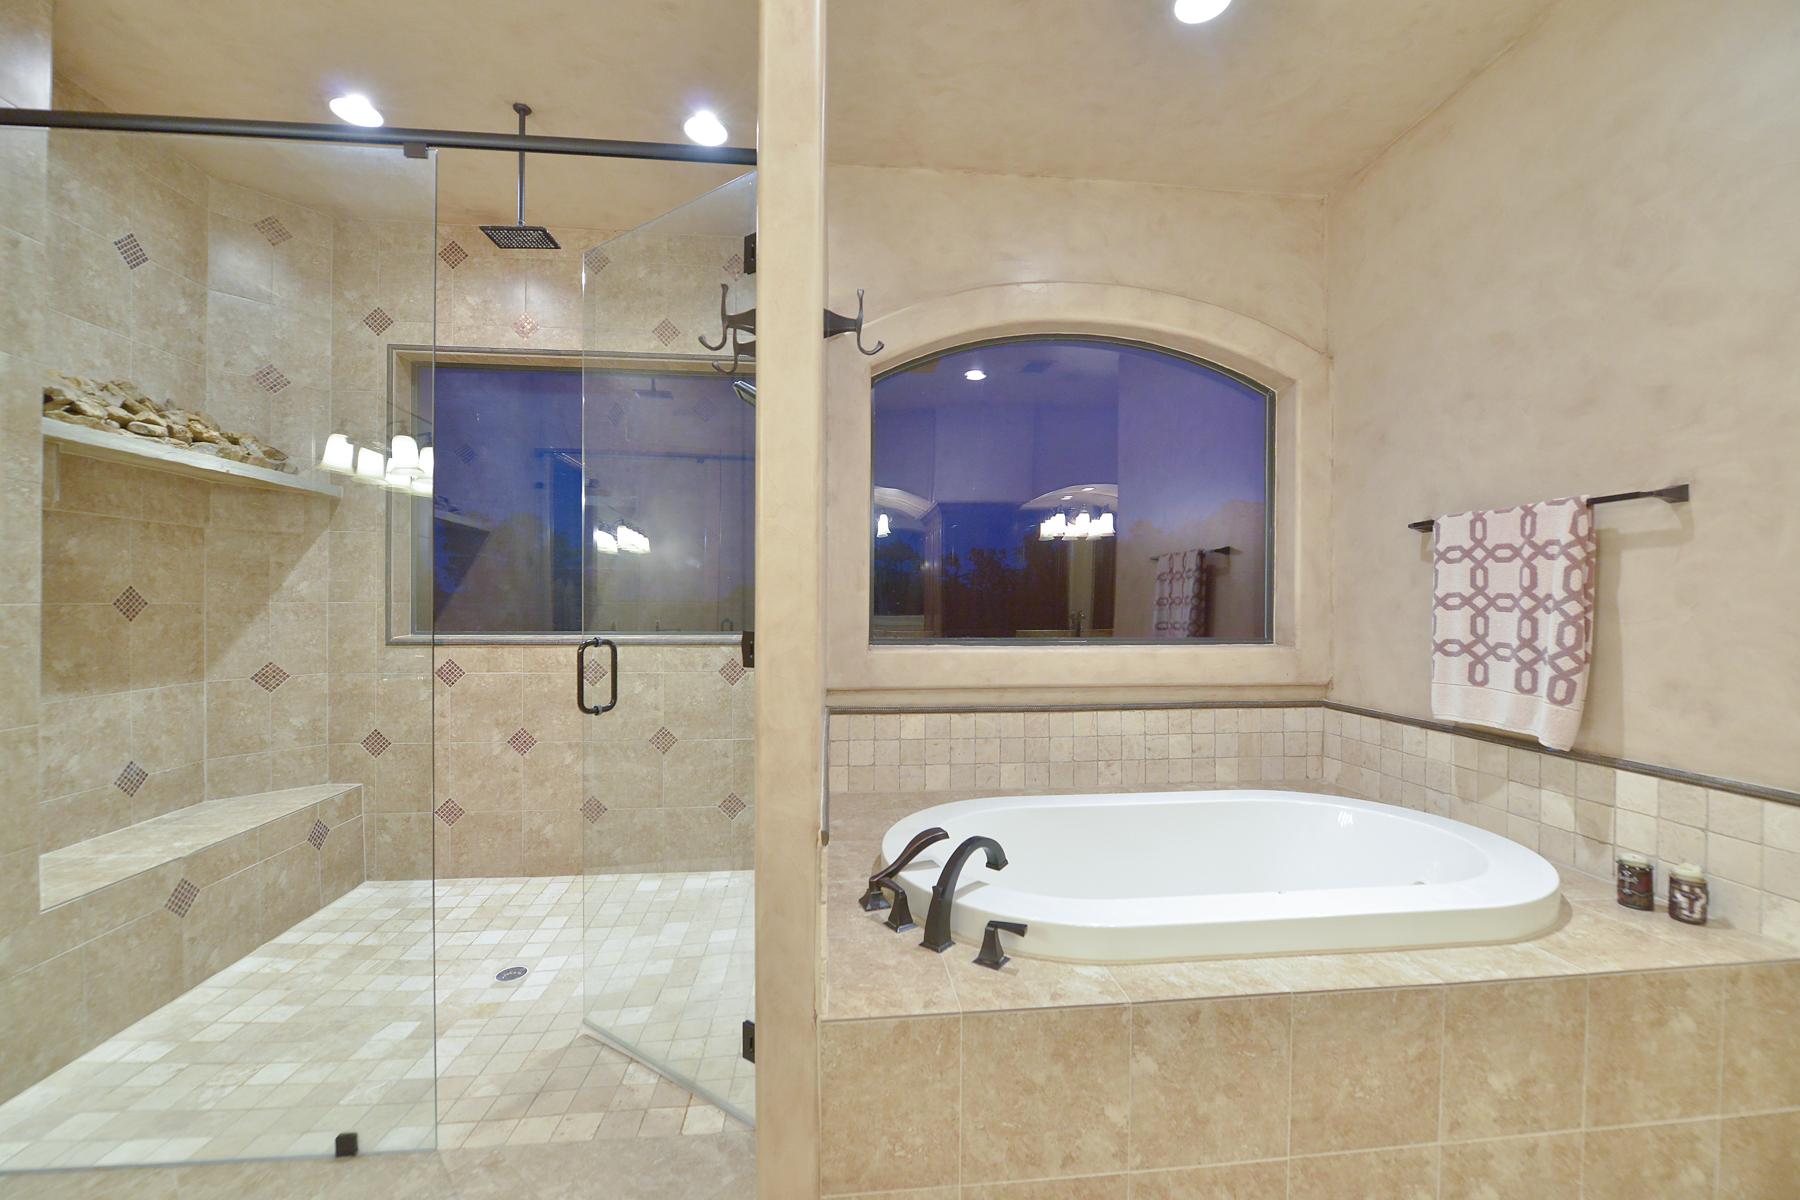 Additional photo for property listing at 15.84+/- Ac Premium Horse Property 47 Pfeiffer Rd Boerne, Texas 78006 Estados Unidos